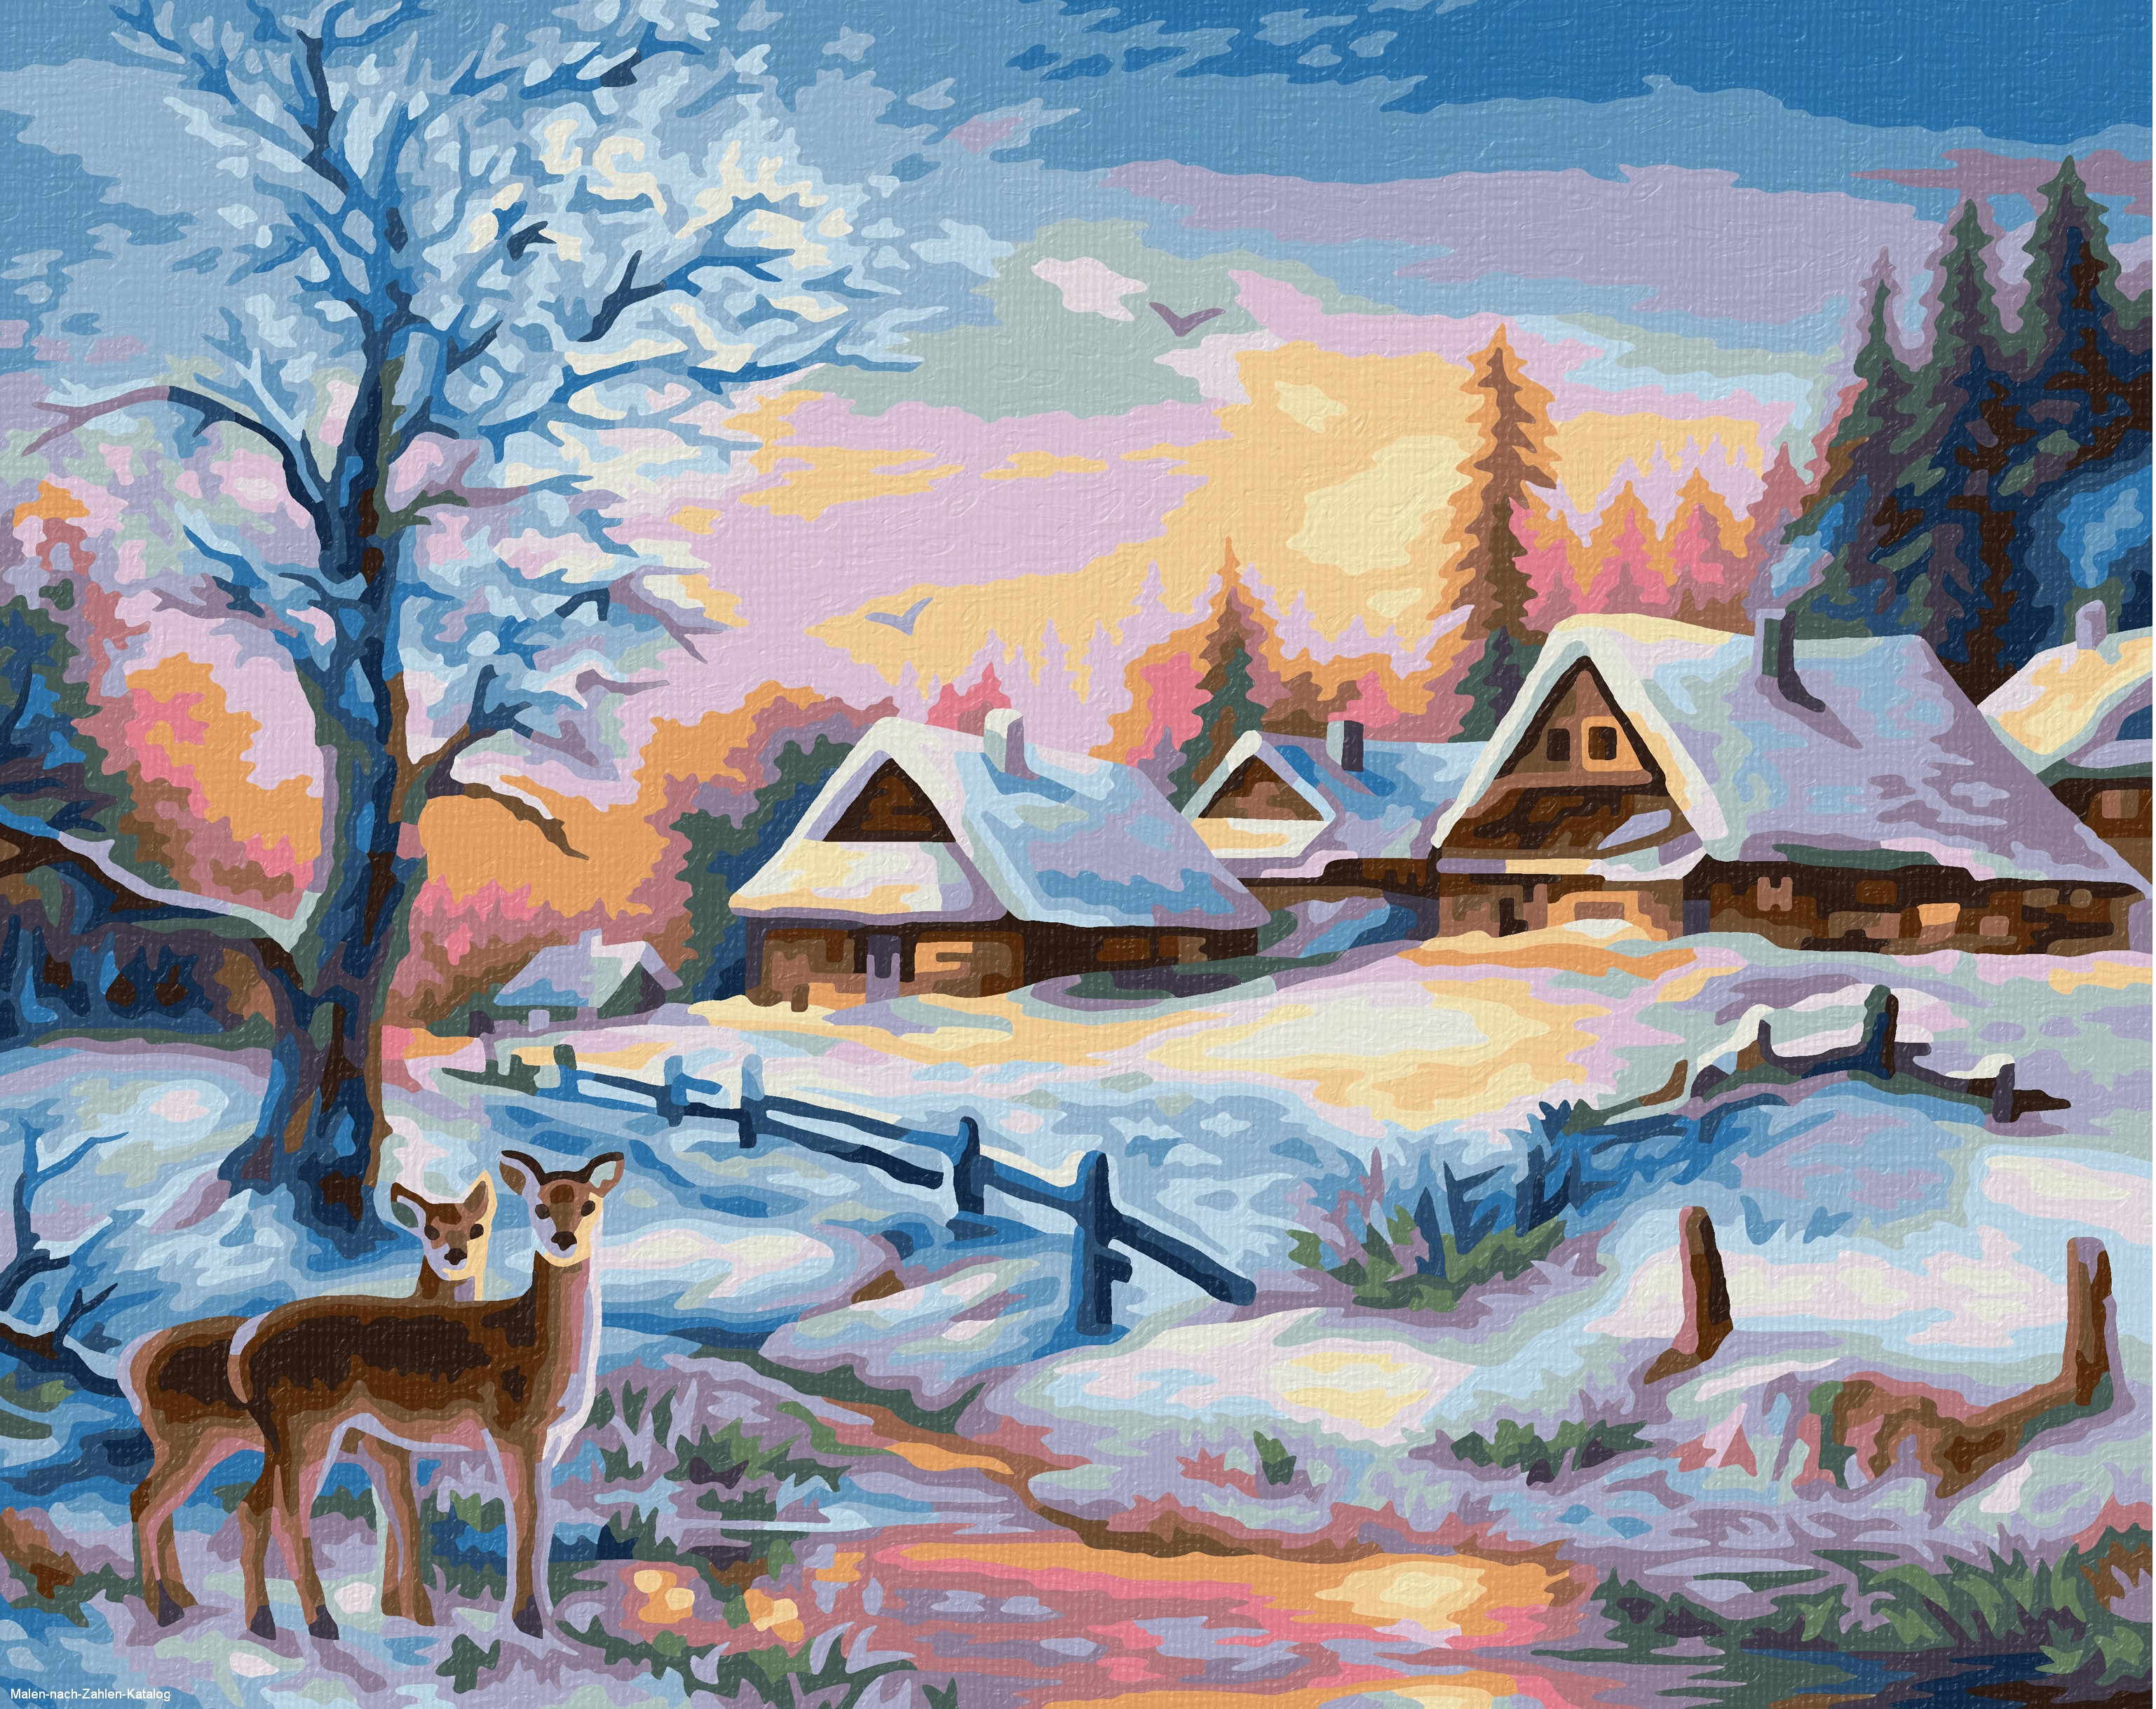 Schipper Malen nach Zahlen Klassiker 24 x 30 cm - Winterlandschaft